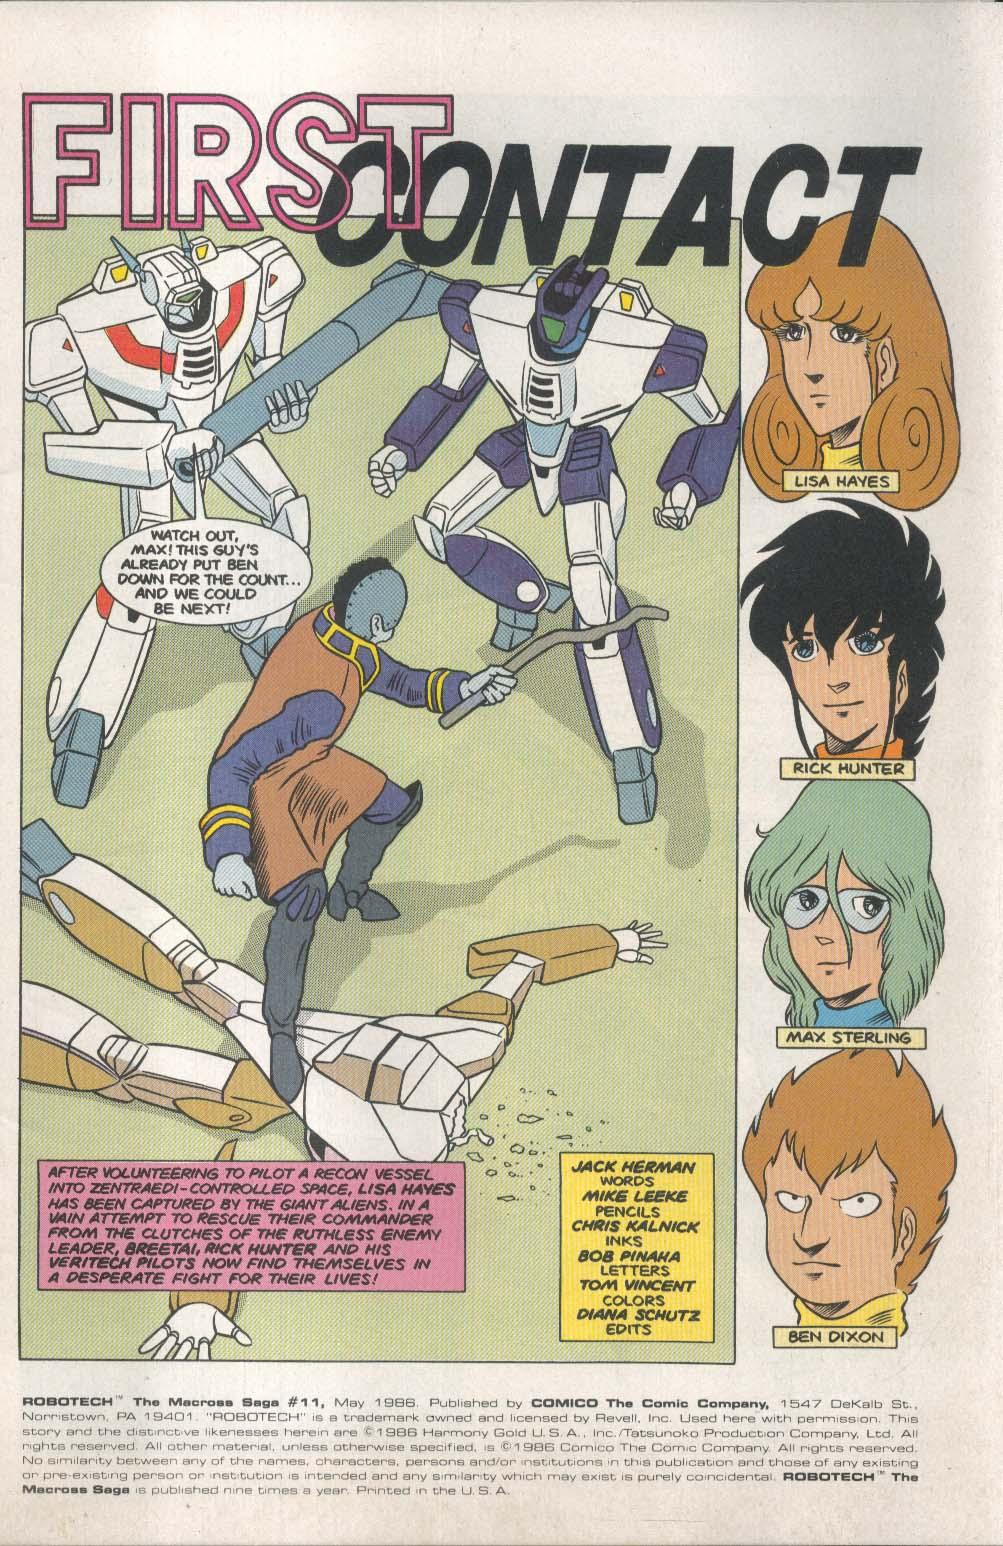 ROBOTECH Macross Saga #11 Comico comic book 5 1986